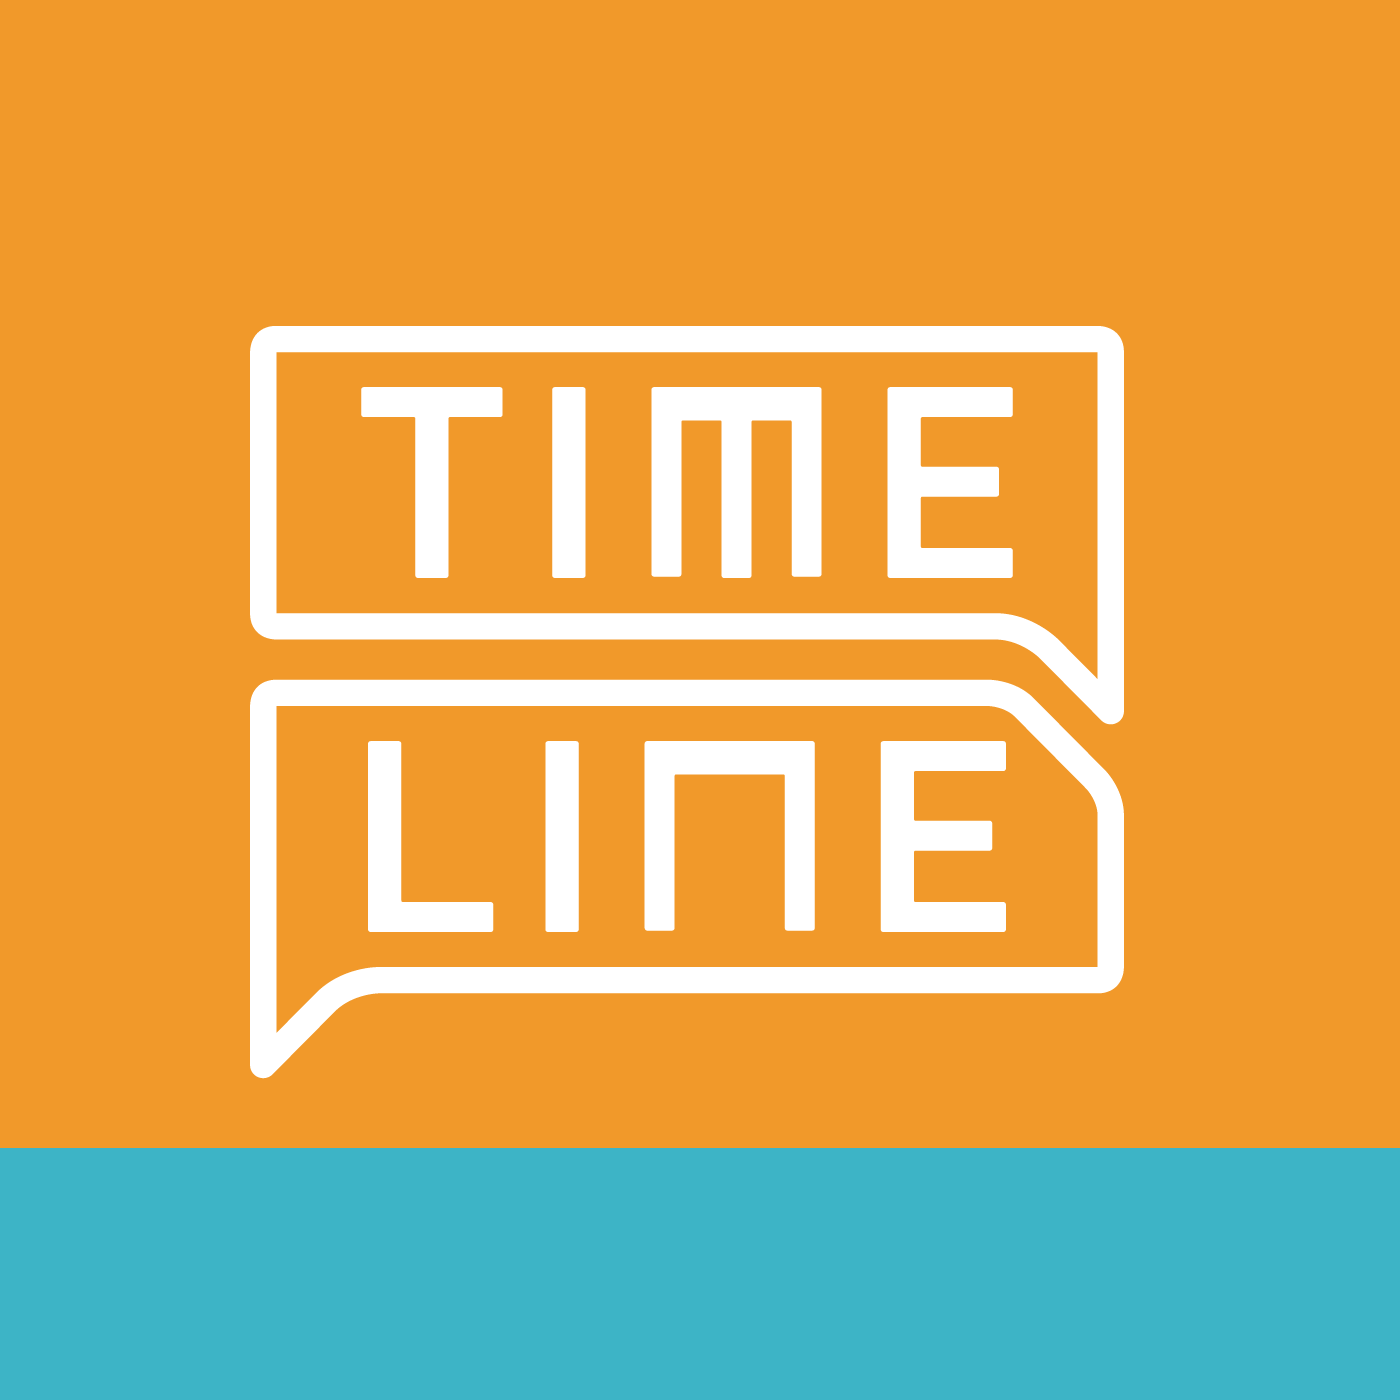 Timeline Gaúcha 12.03.2018